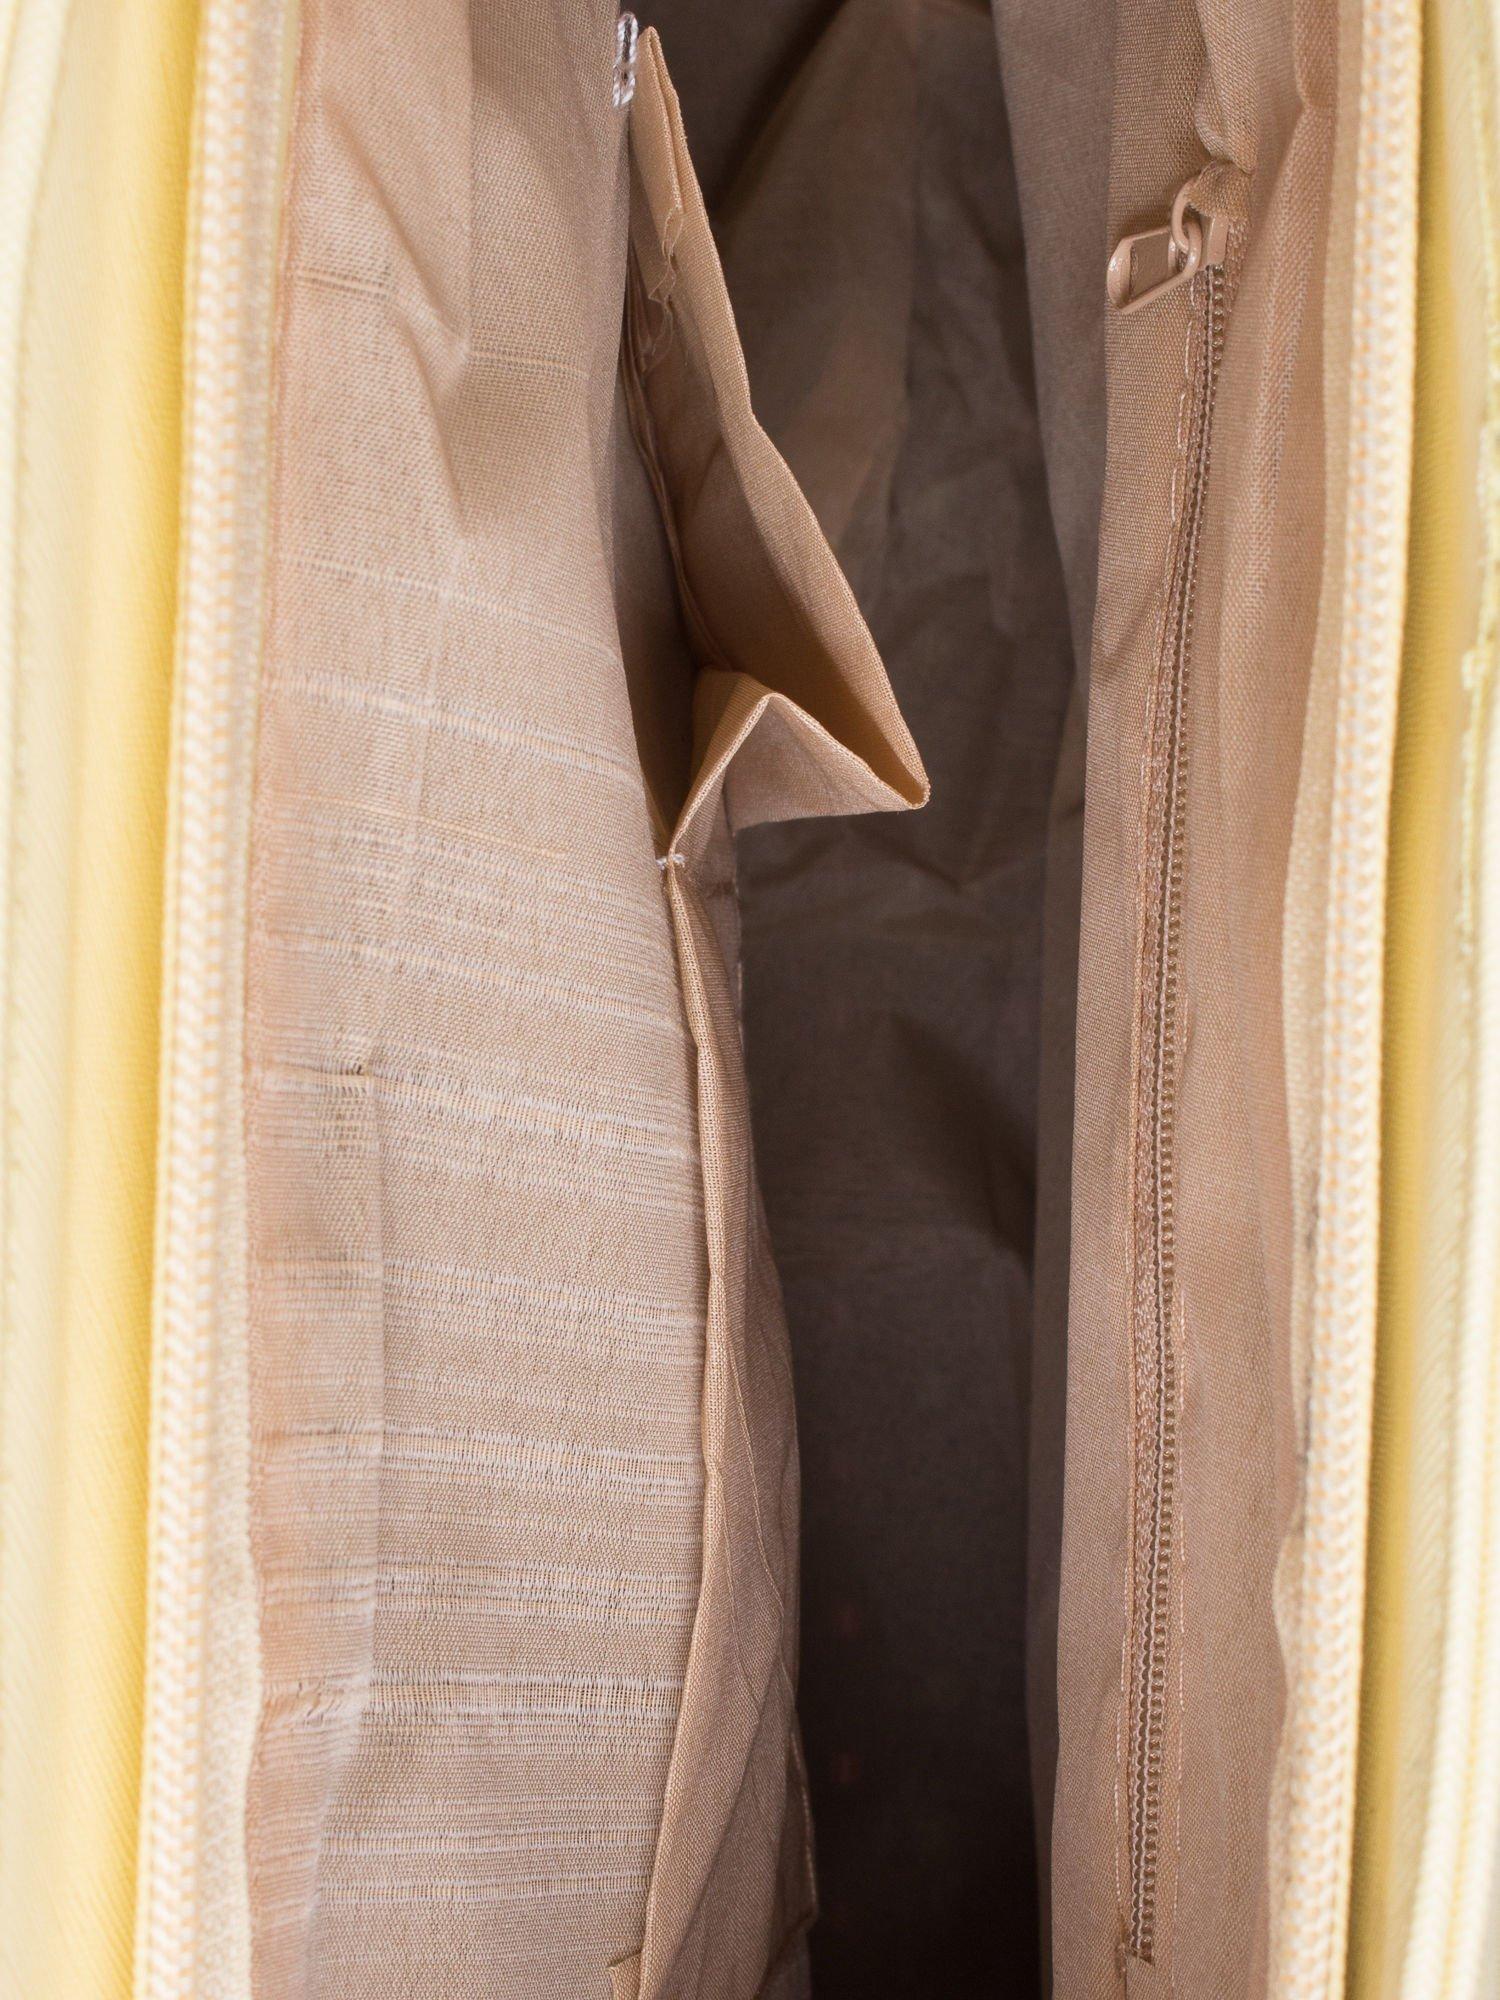 Żółta torba shopper bag z odpinanym paskiem                                  zdj.                                  4